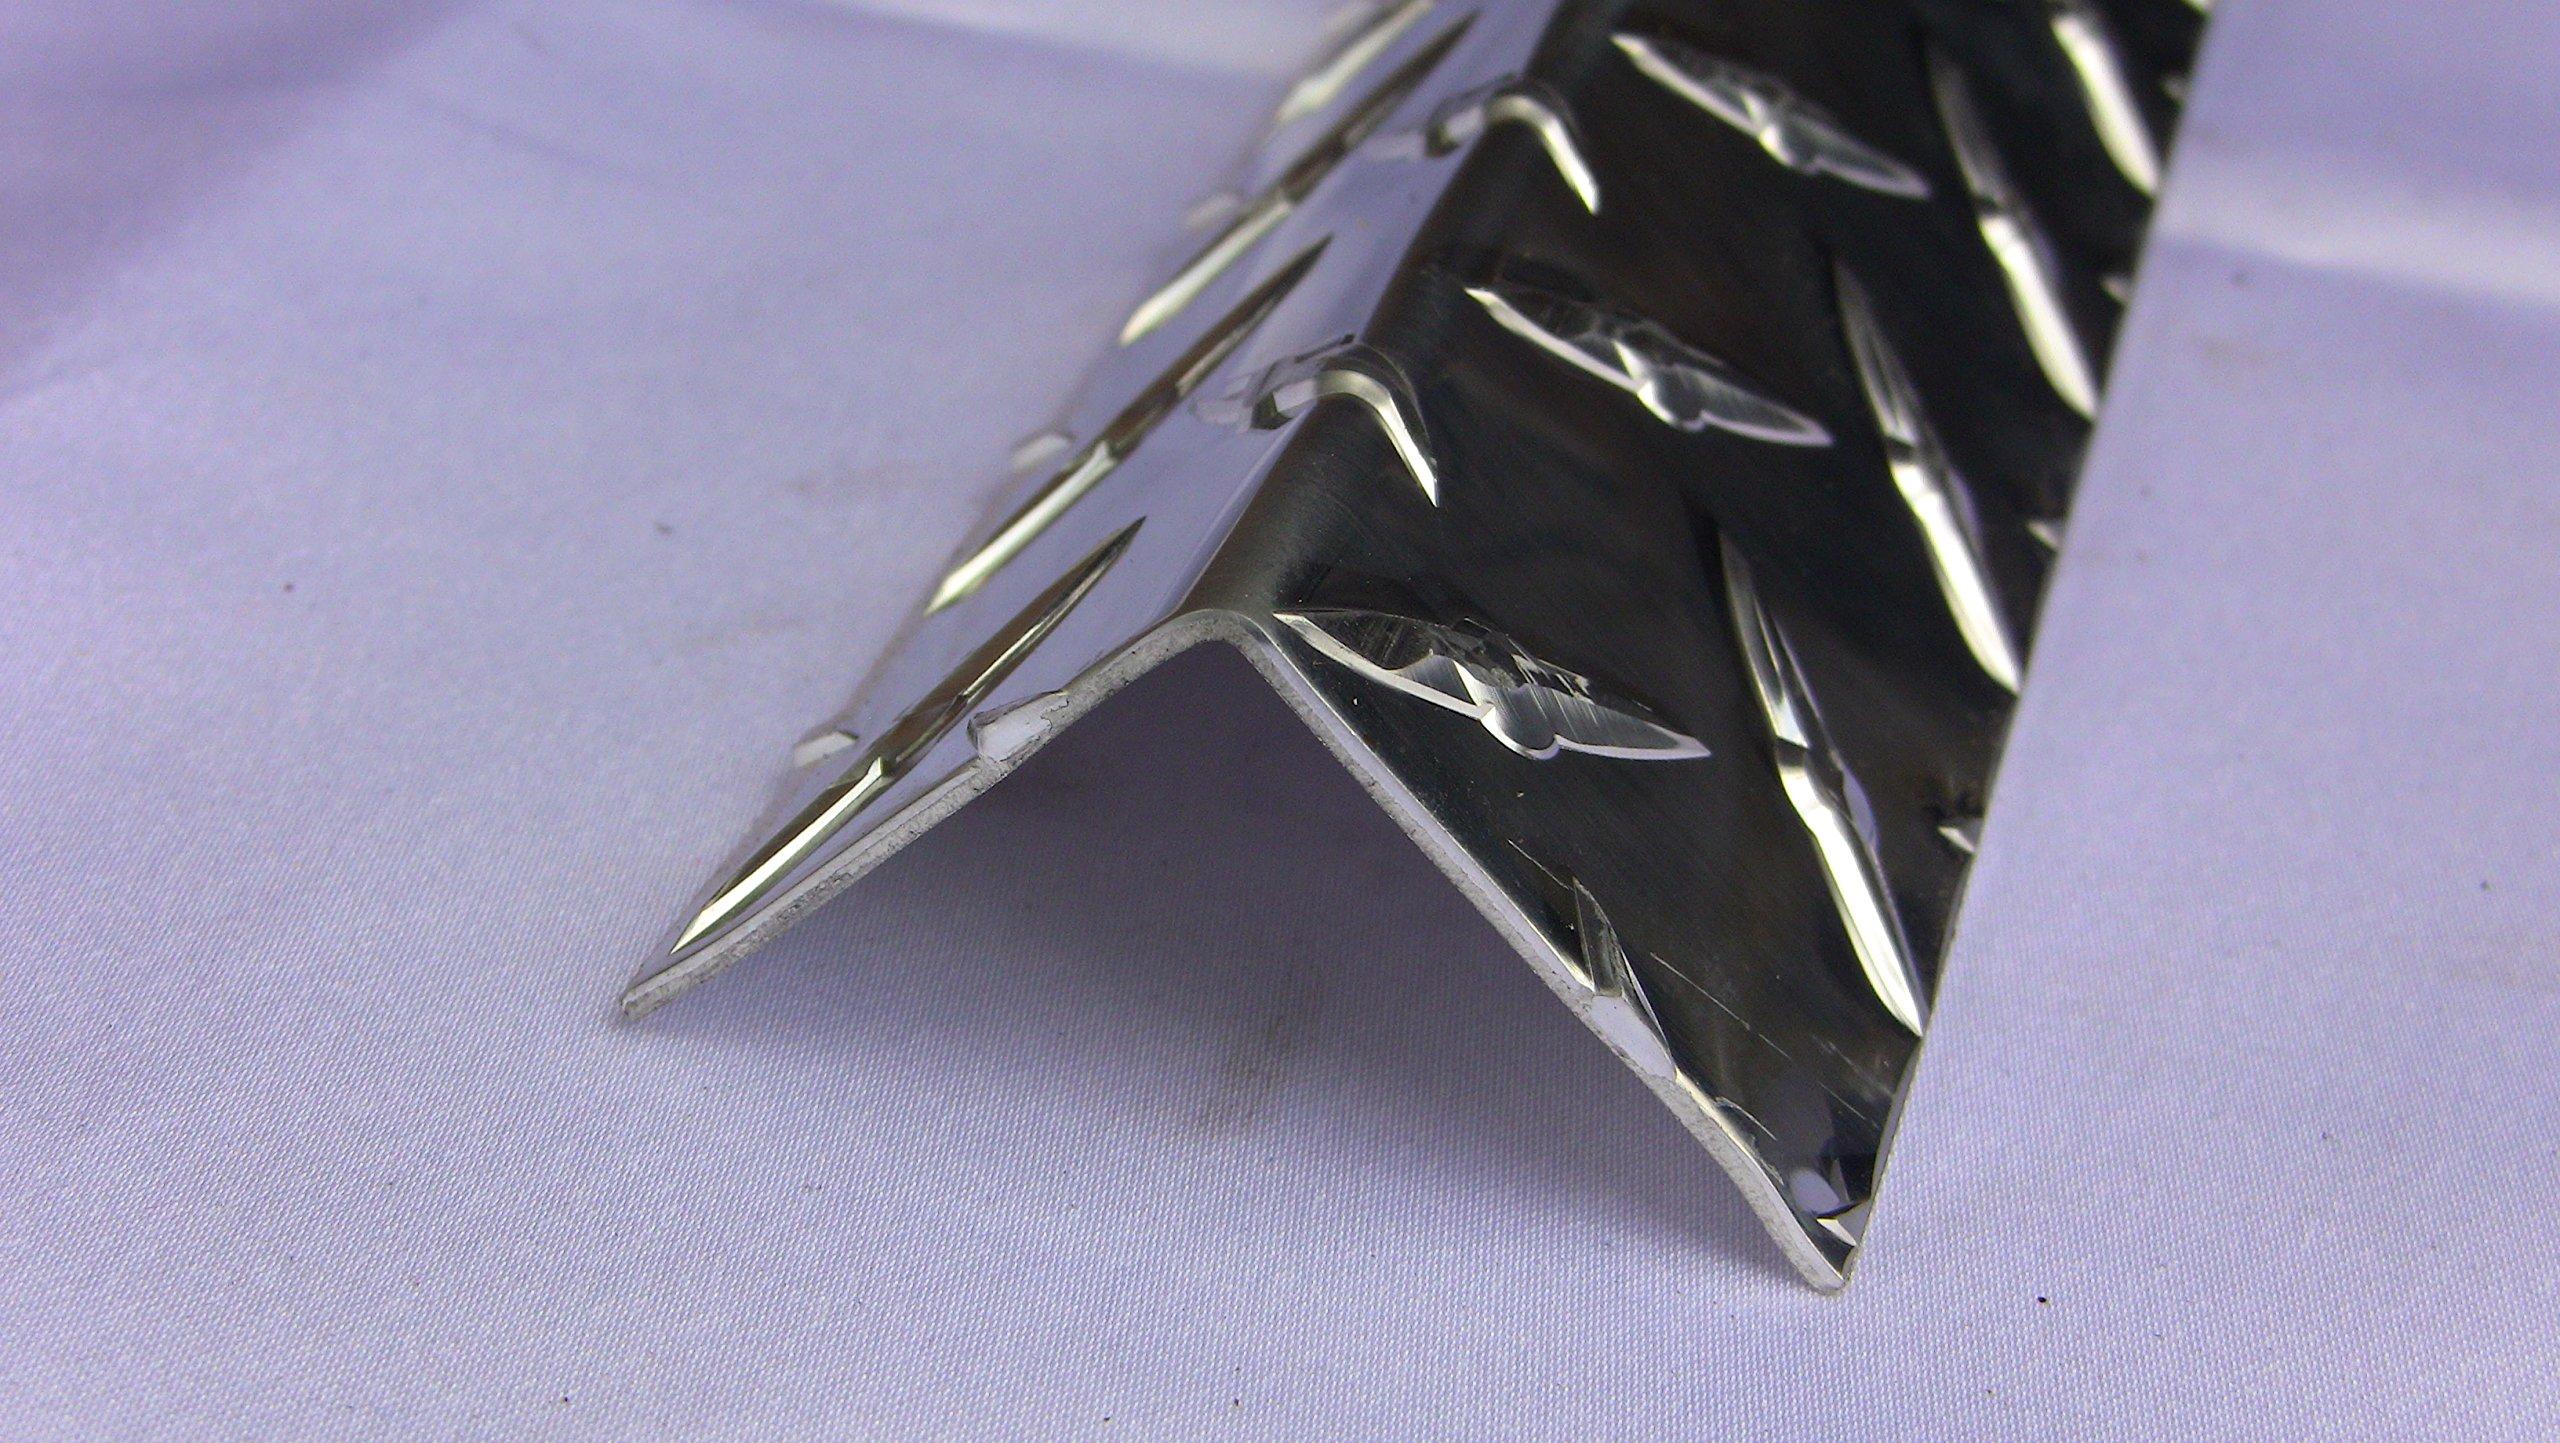 Aluminum Diamond Plate Angle .062 x 1.5 x 1.5 x 84 in. UAAC | (1/16 x 1-1/2 x 1-1/2 x 84 in.)